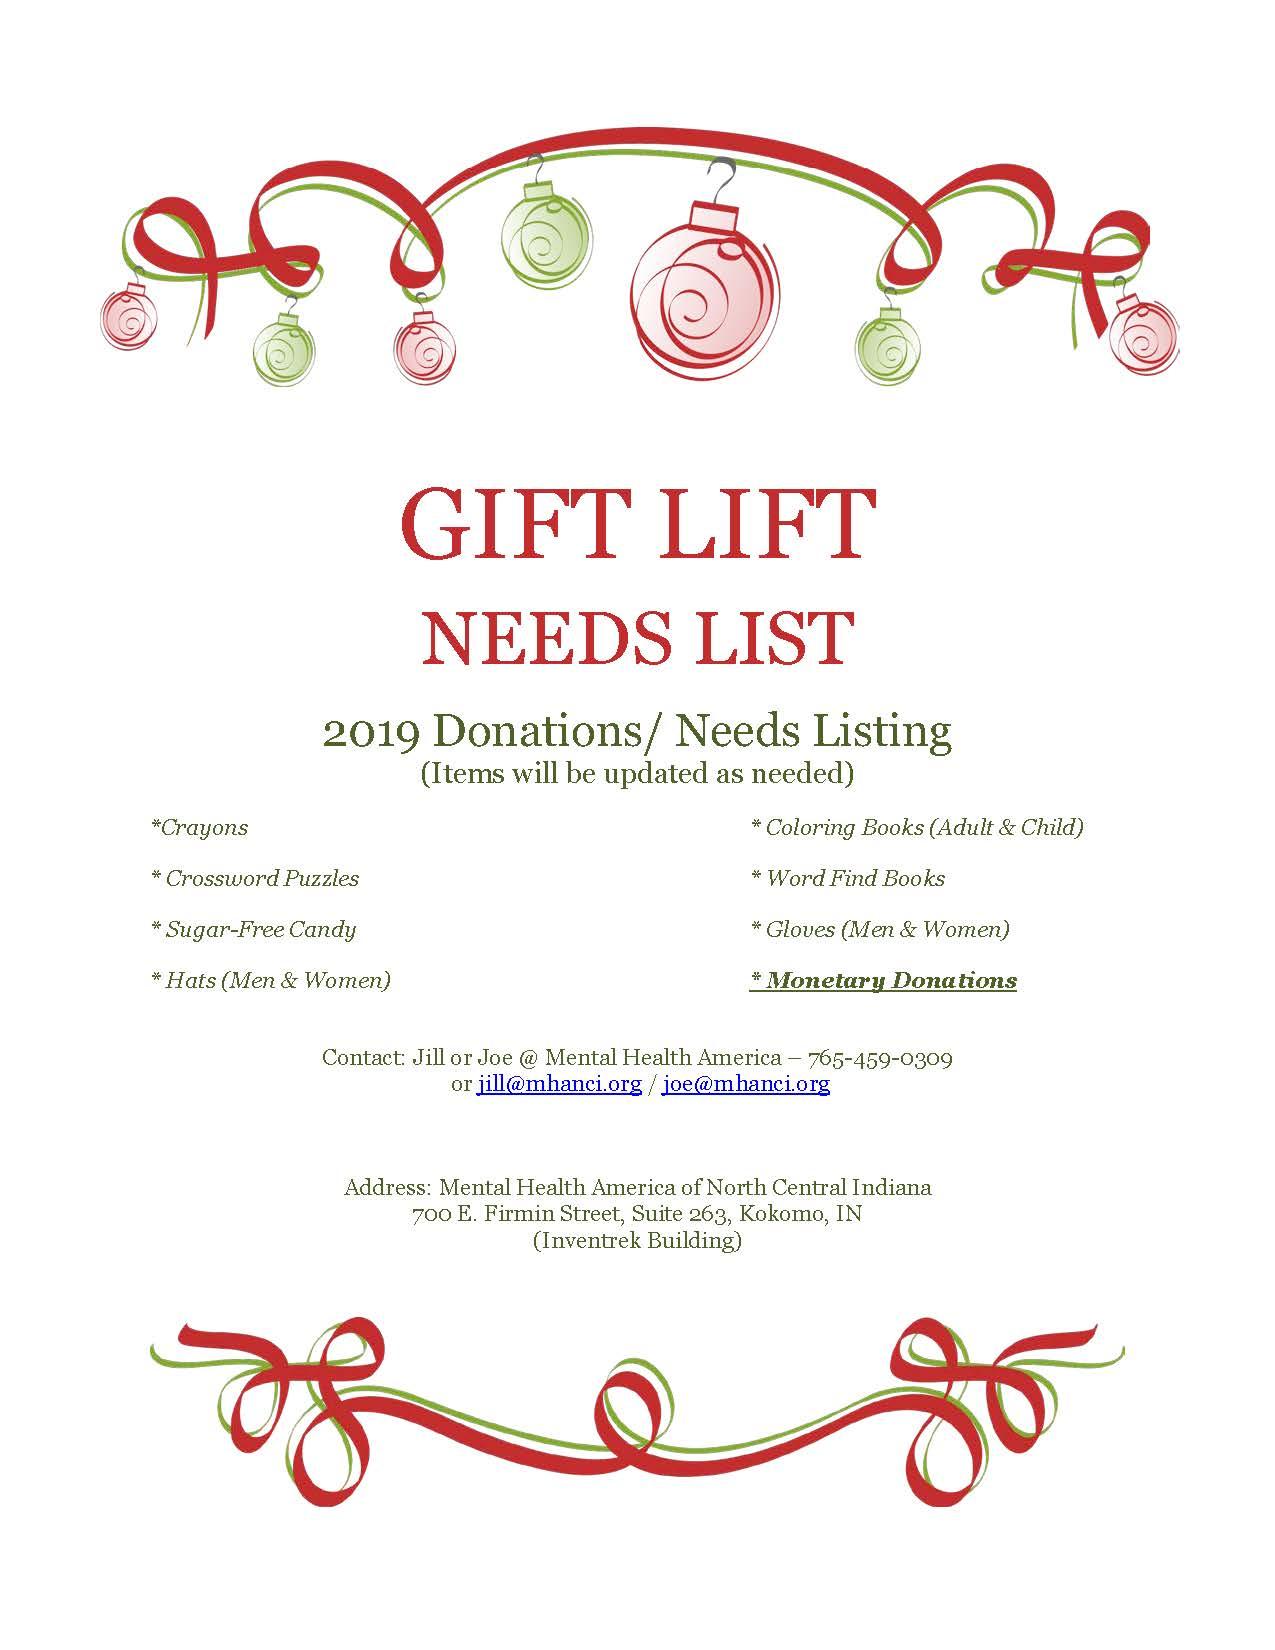 Gift Lift Update